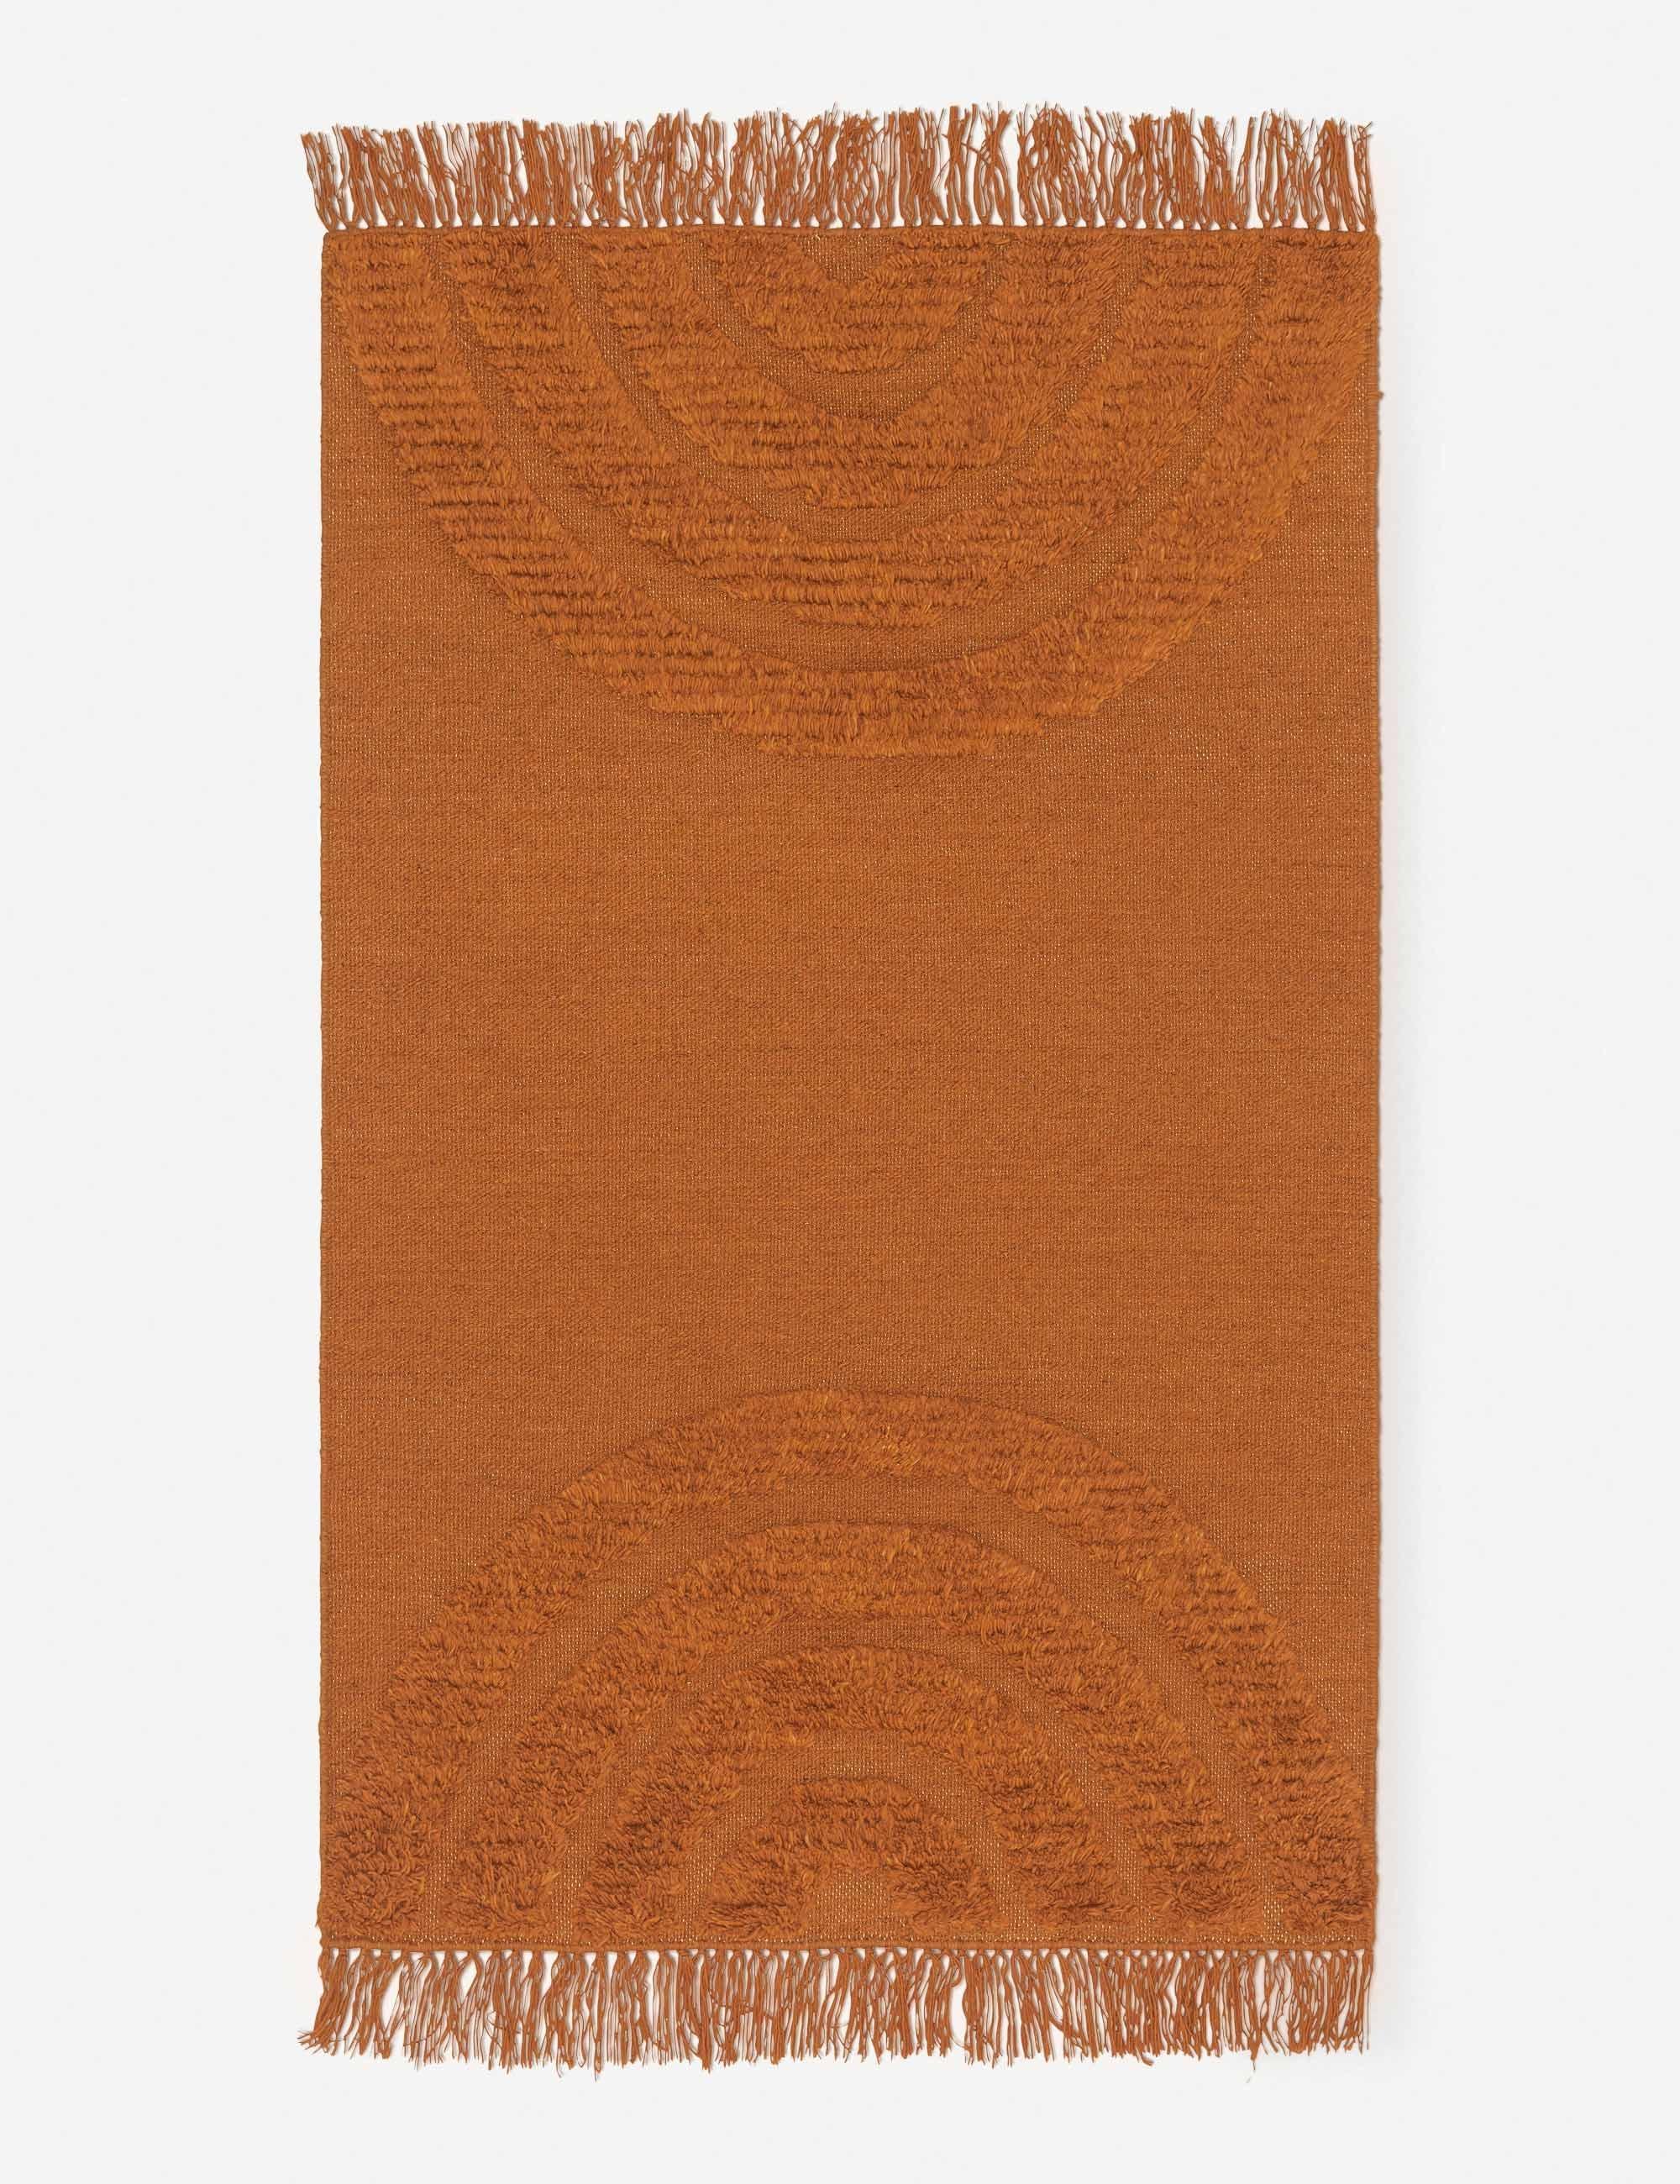 Arches Rug, Rust By Sarah Sherman Samuel 3' x 5'